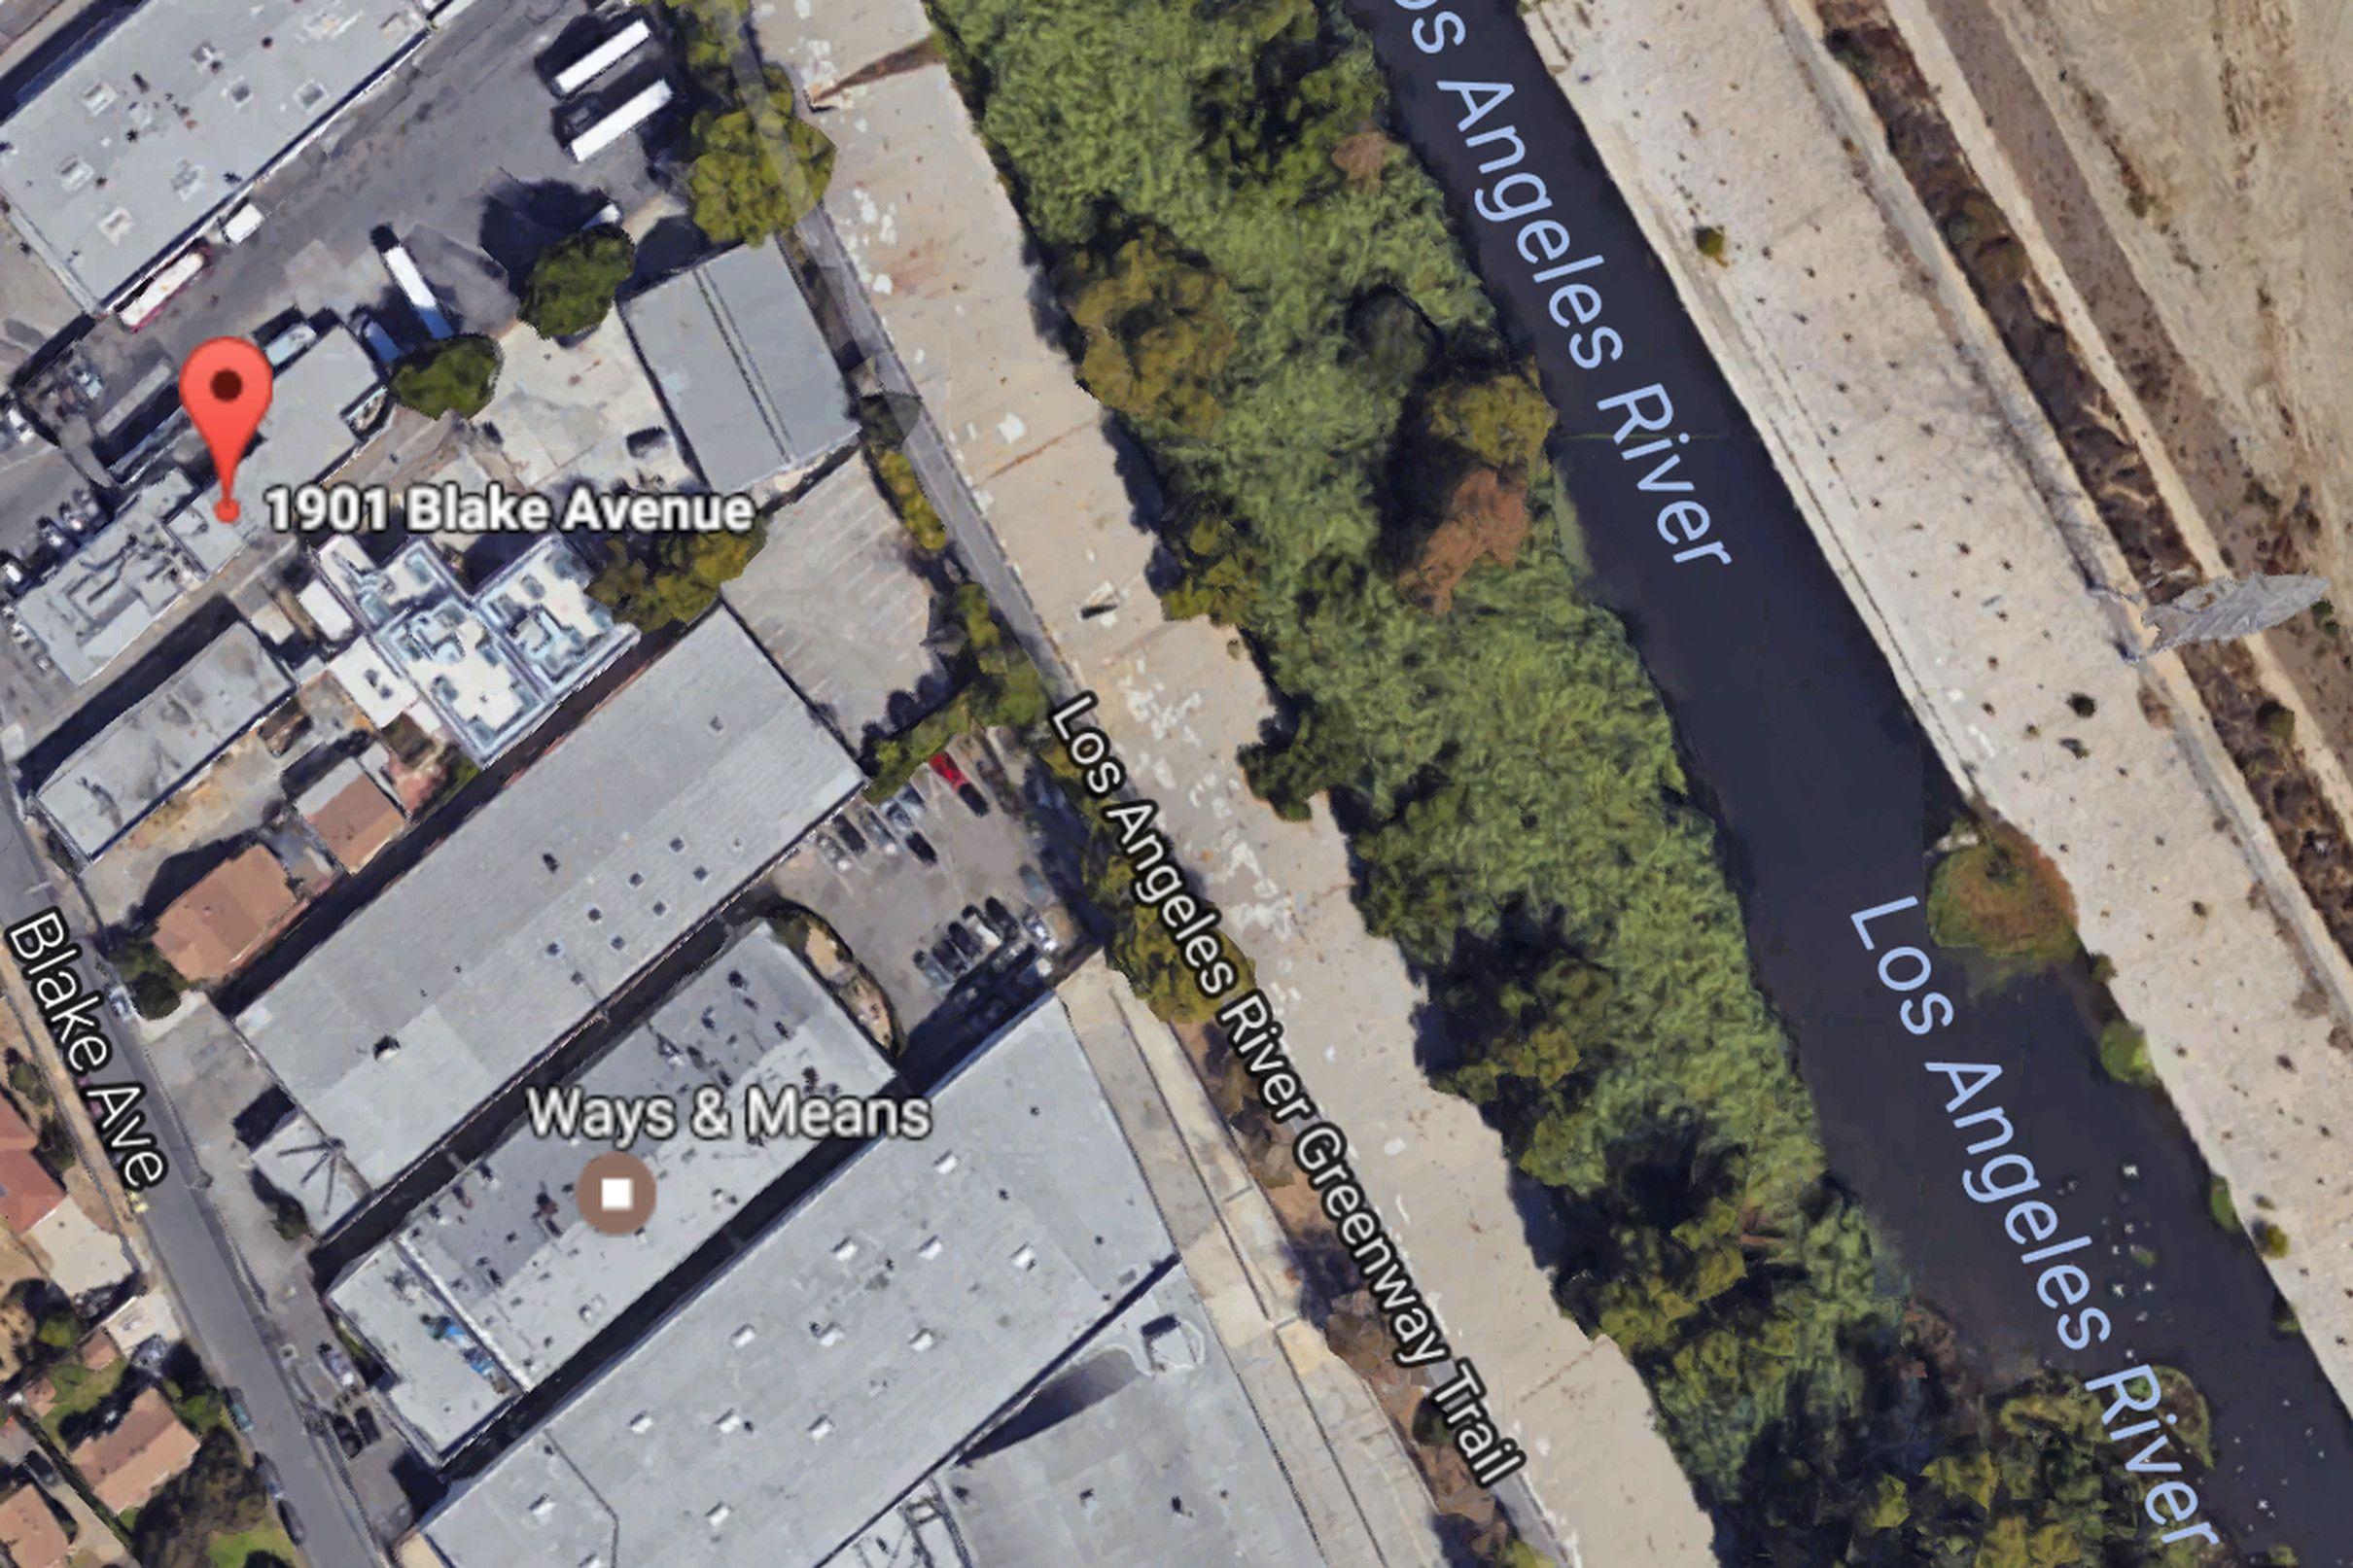 Developer Plans 53 Live Work Units Next To The La River River City Urban Planning